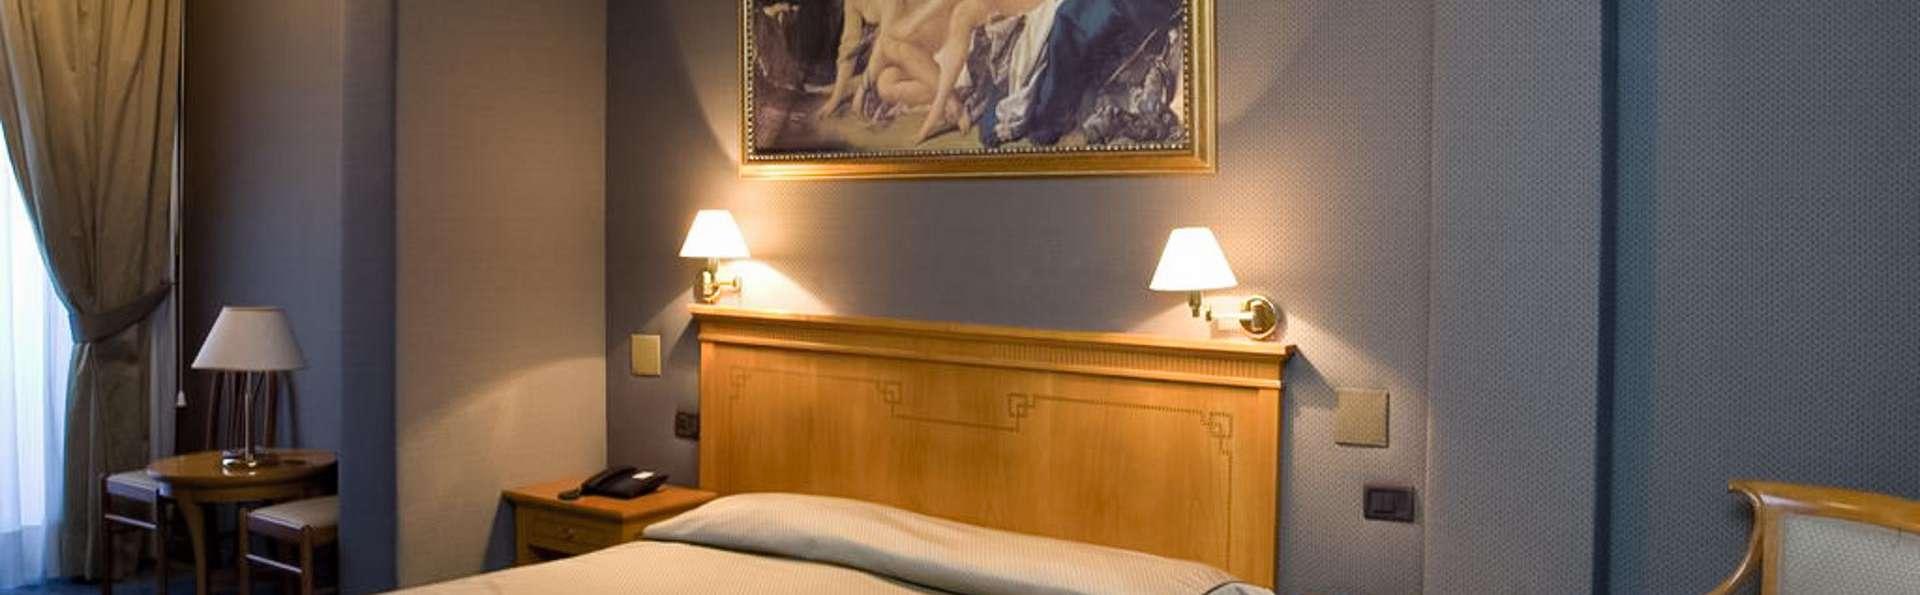 Hotel Rimini - EDIT_ROOM_02.jpg